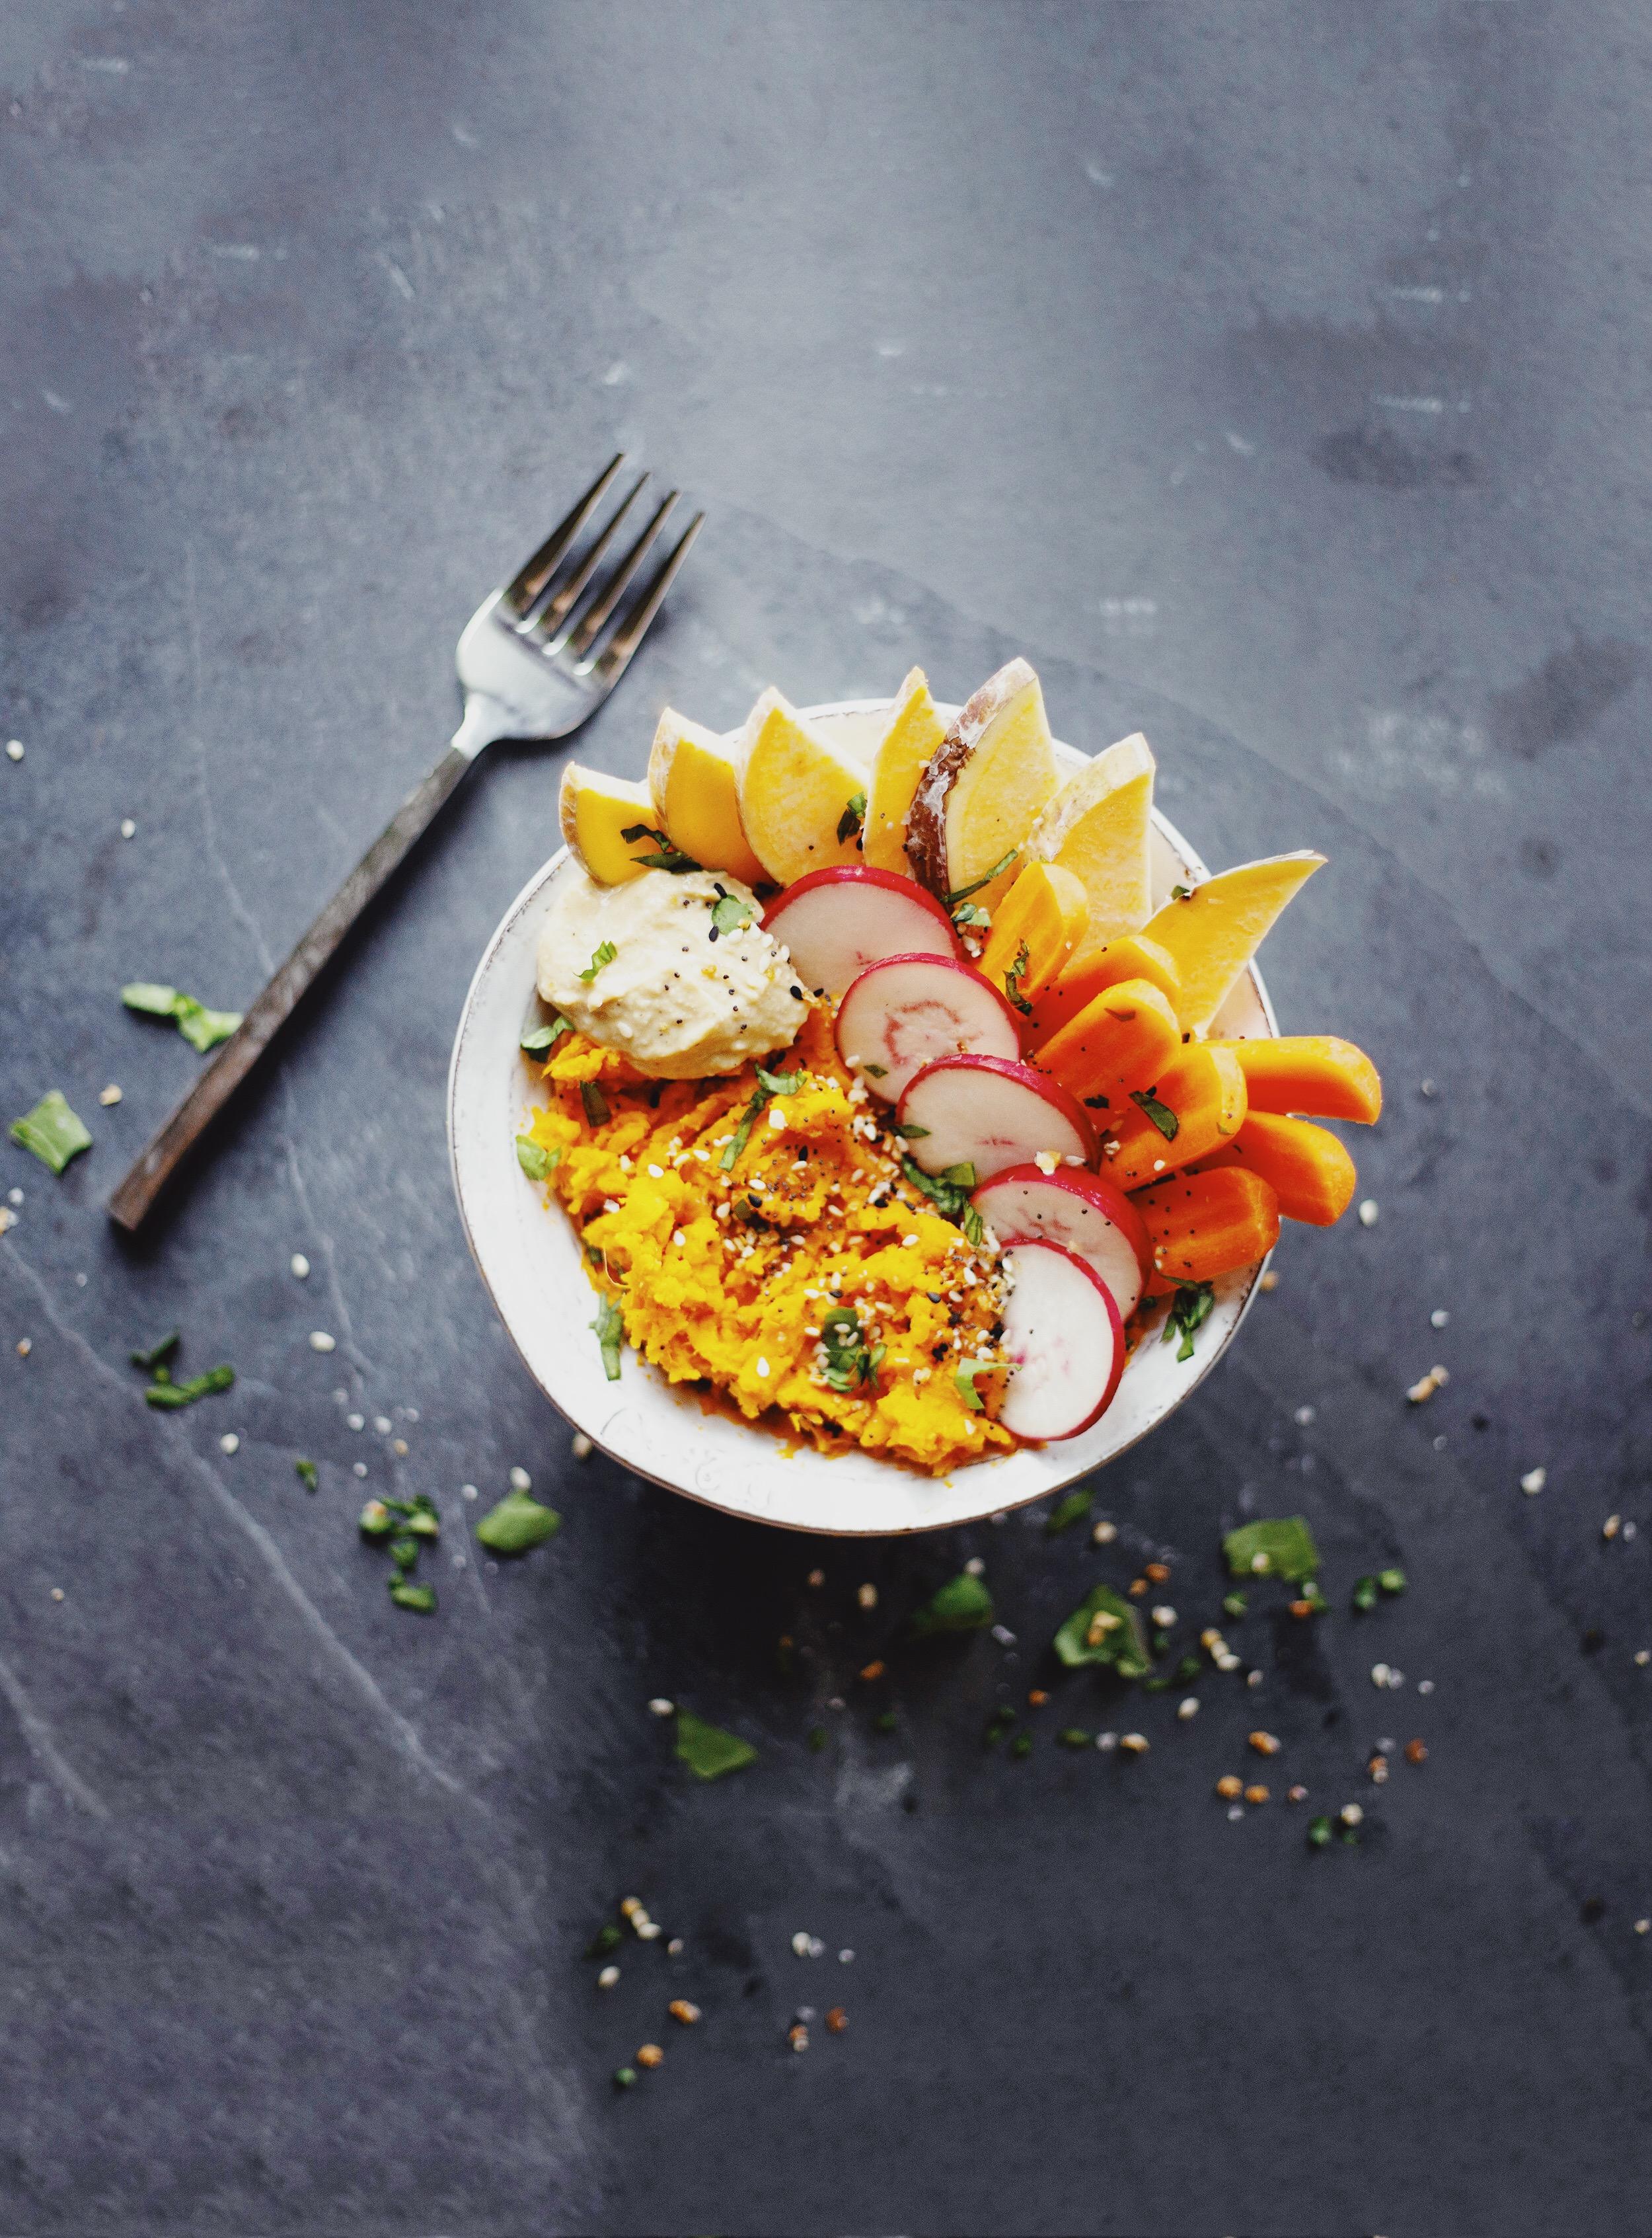 7-minute Sweet Potato Bowl Recipe - gluten free and vegan